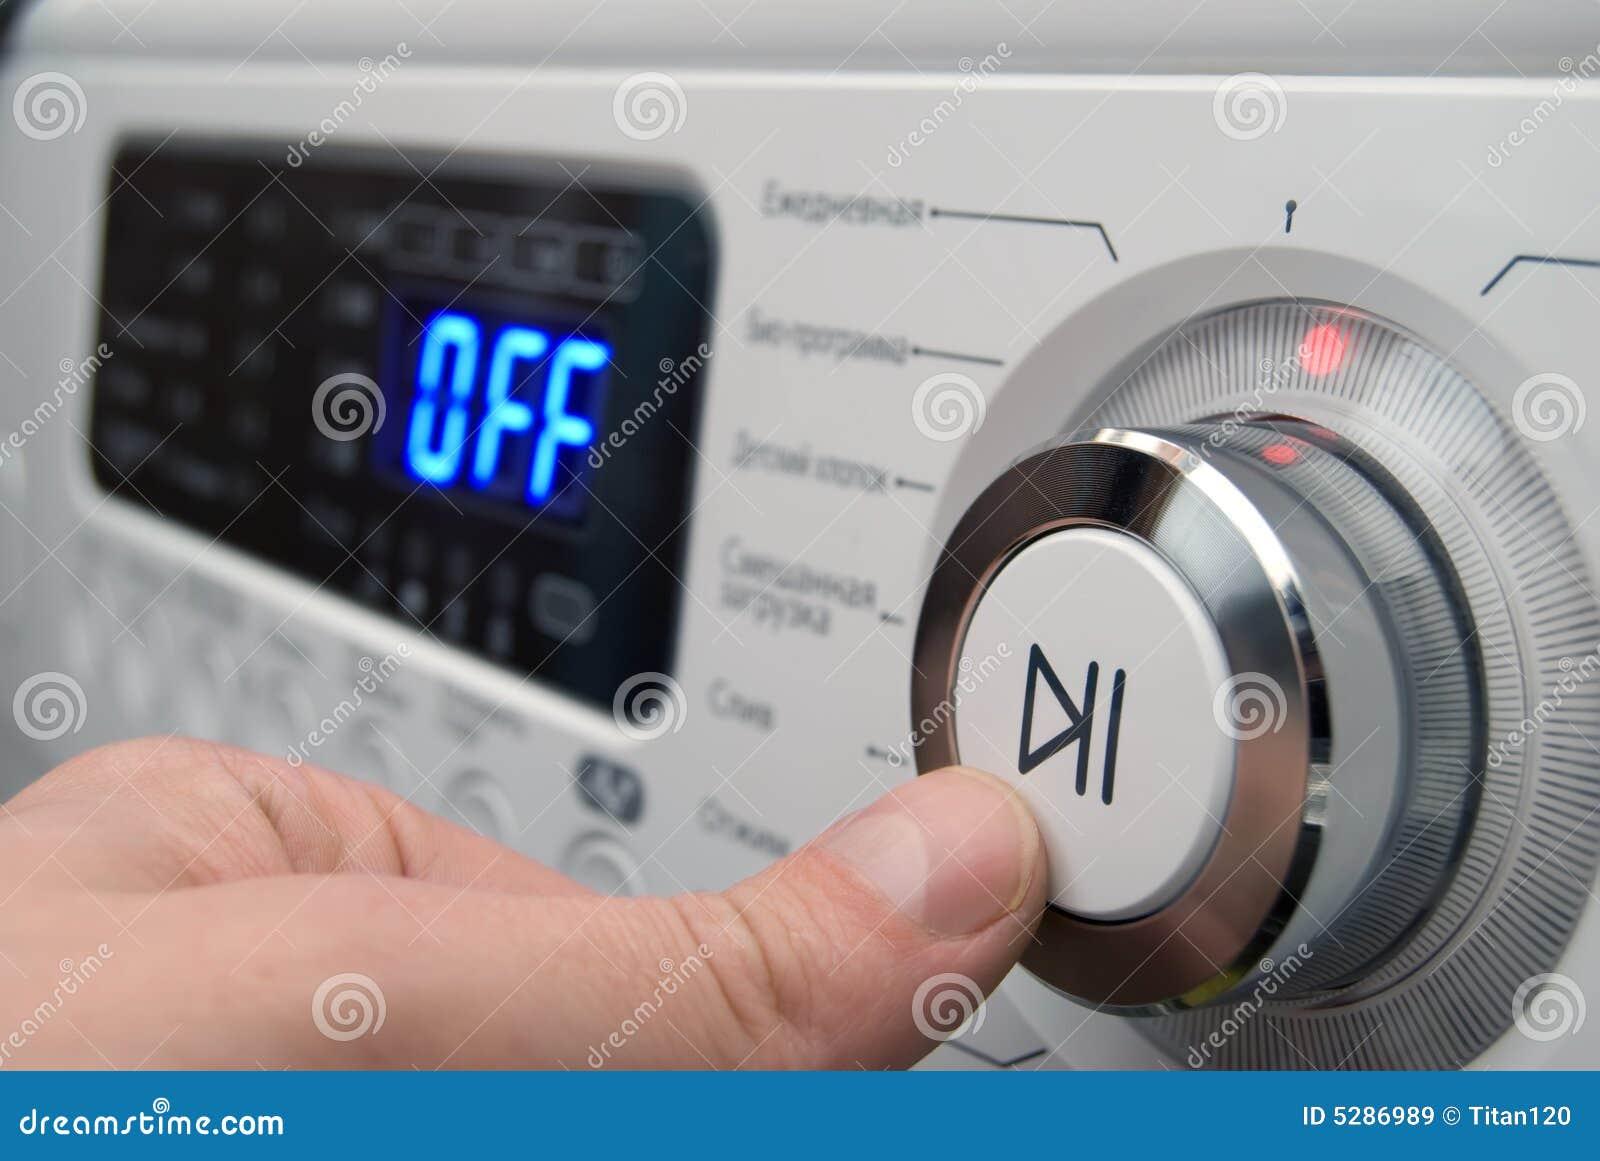 Washing Machine Controls : Button on a control of washing machine panel royalty free